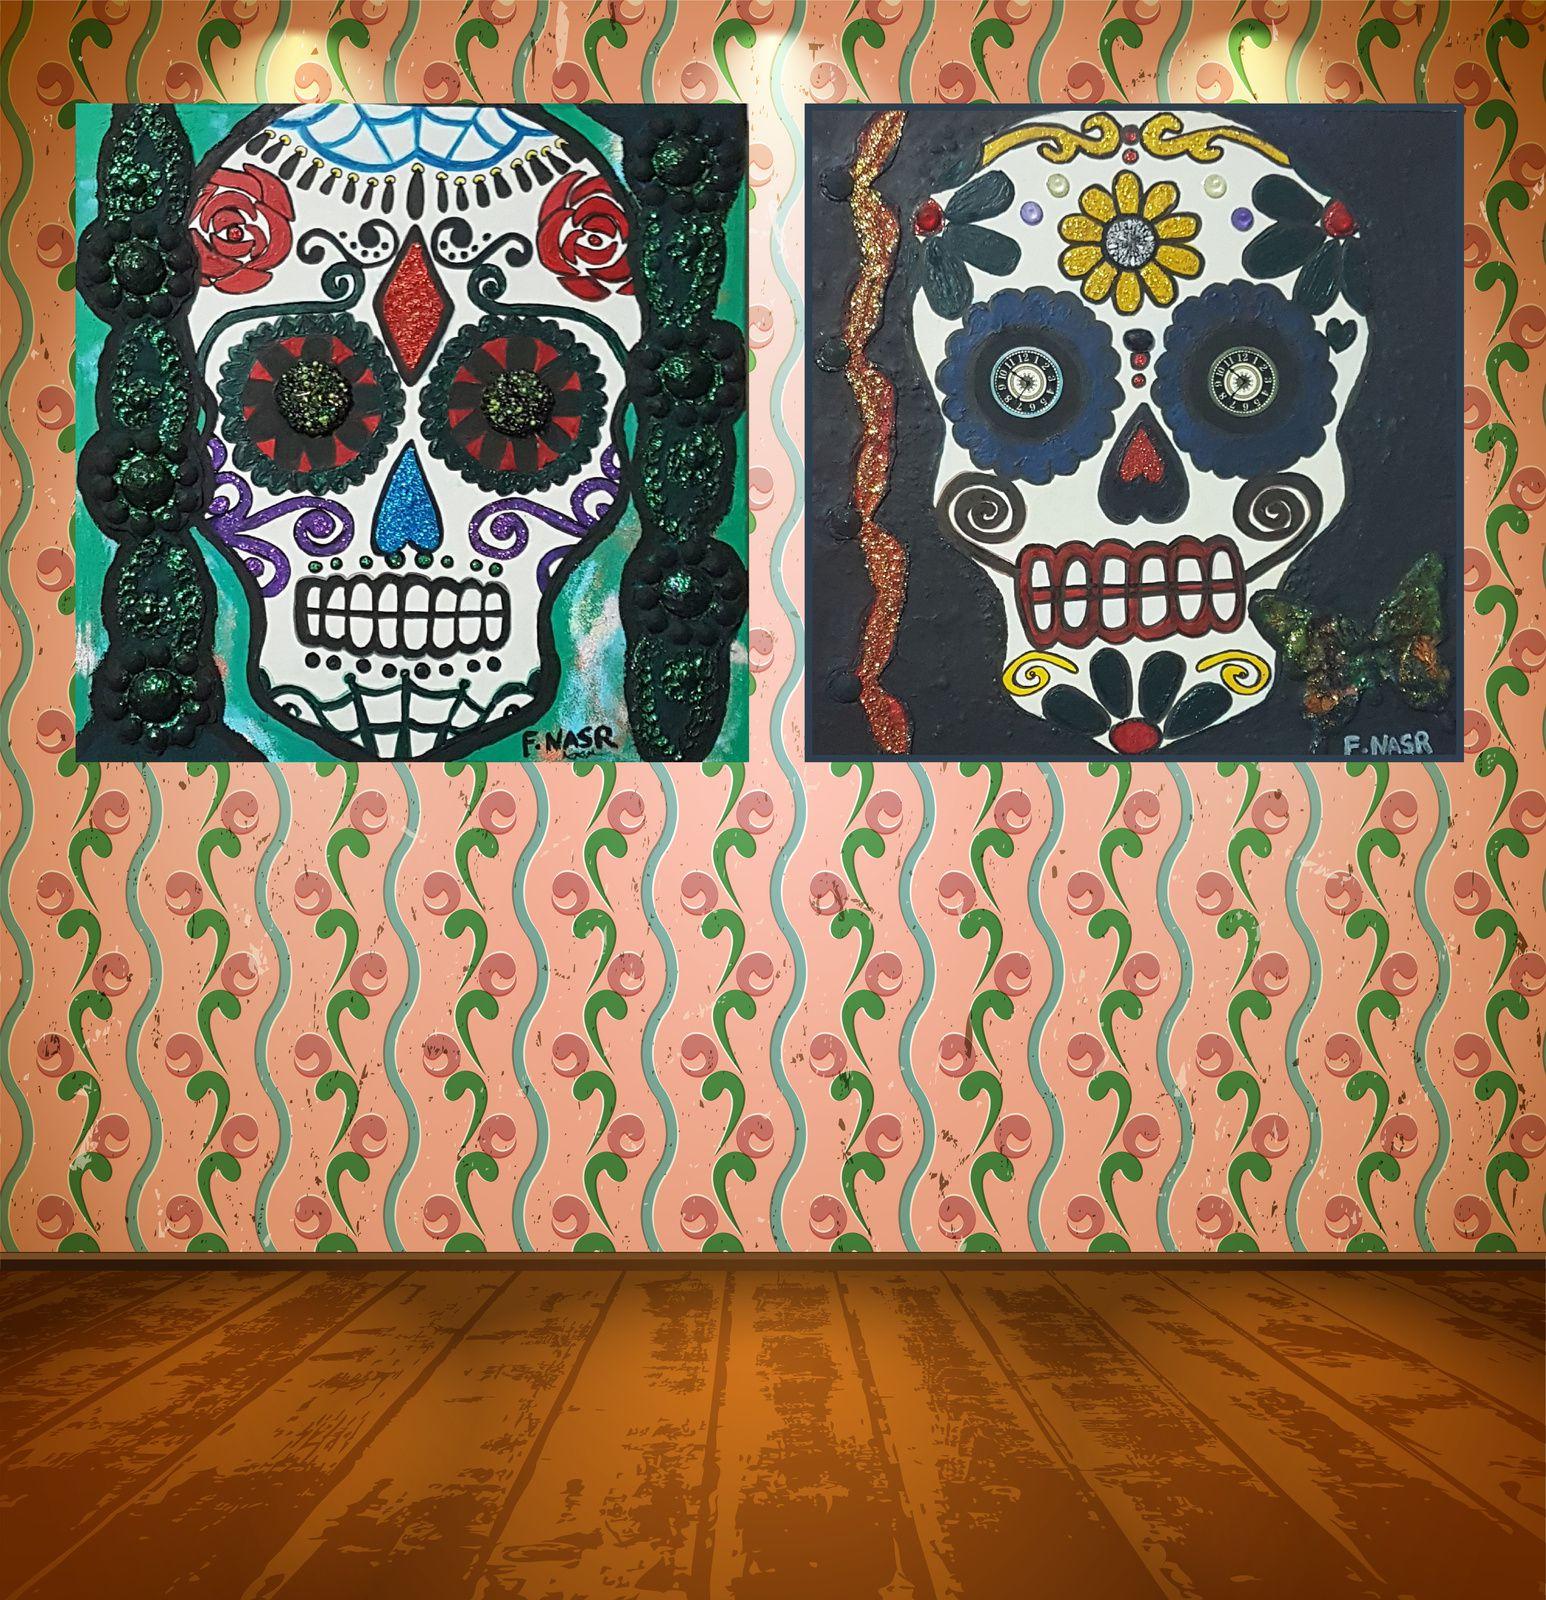 calaveras skull, têtes de mort, tableaux mexicains, jour des morts, peintures mexicaine, Peinture technique mixte, Muertos sur toile, Fathia Nasr, Crânes mexicains peinture, Sugar Skull peinture, day of the dead, El Dia de los Muertos, Tableau Calavera, Peinture Calavera,